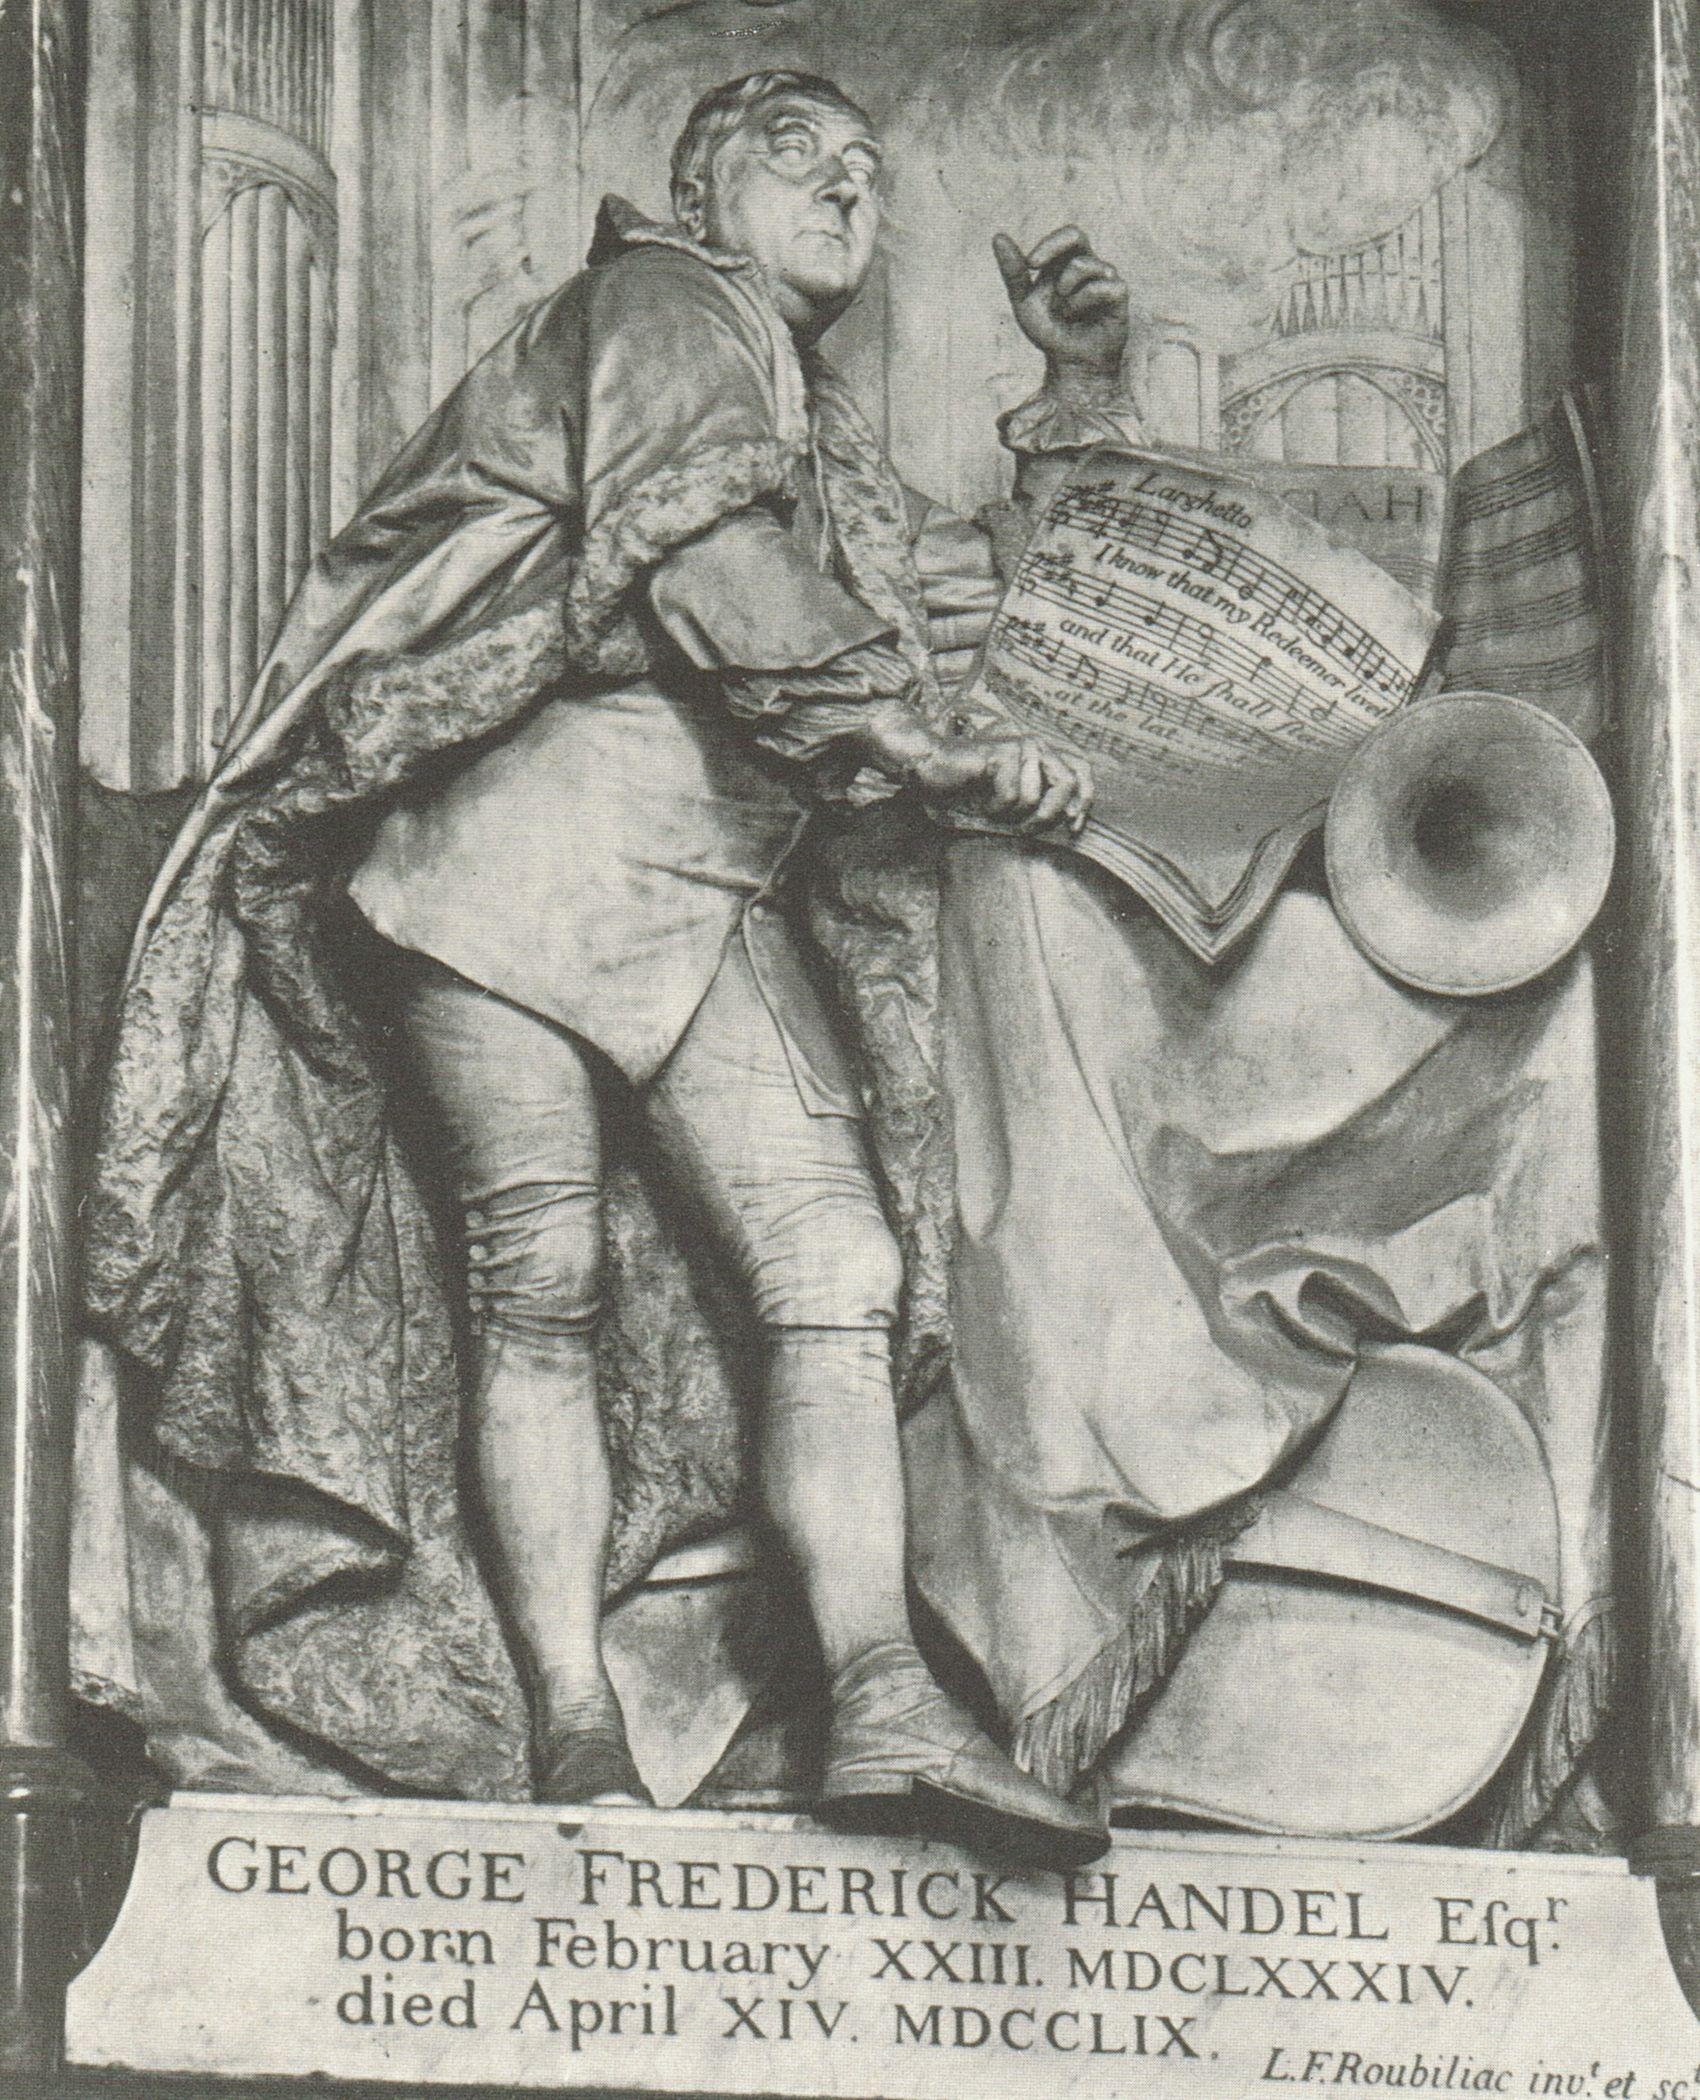 Georg_Friedrich HÄNDEL, Westminster Abbey, London